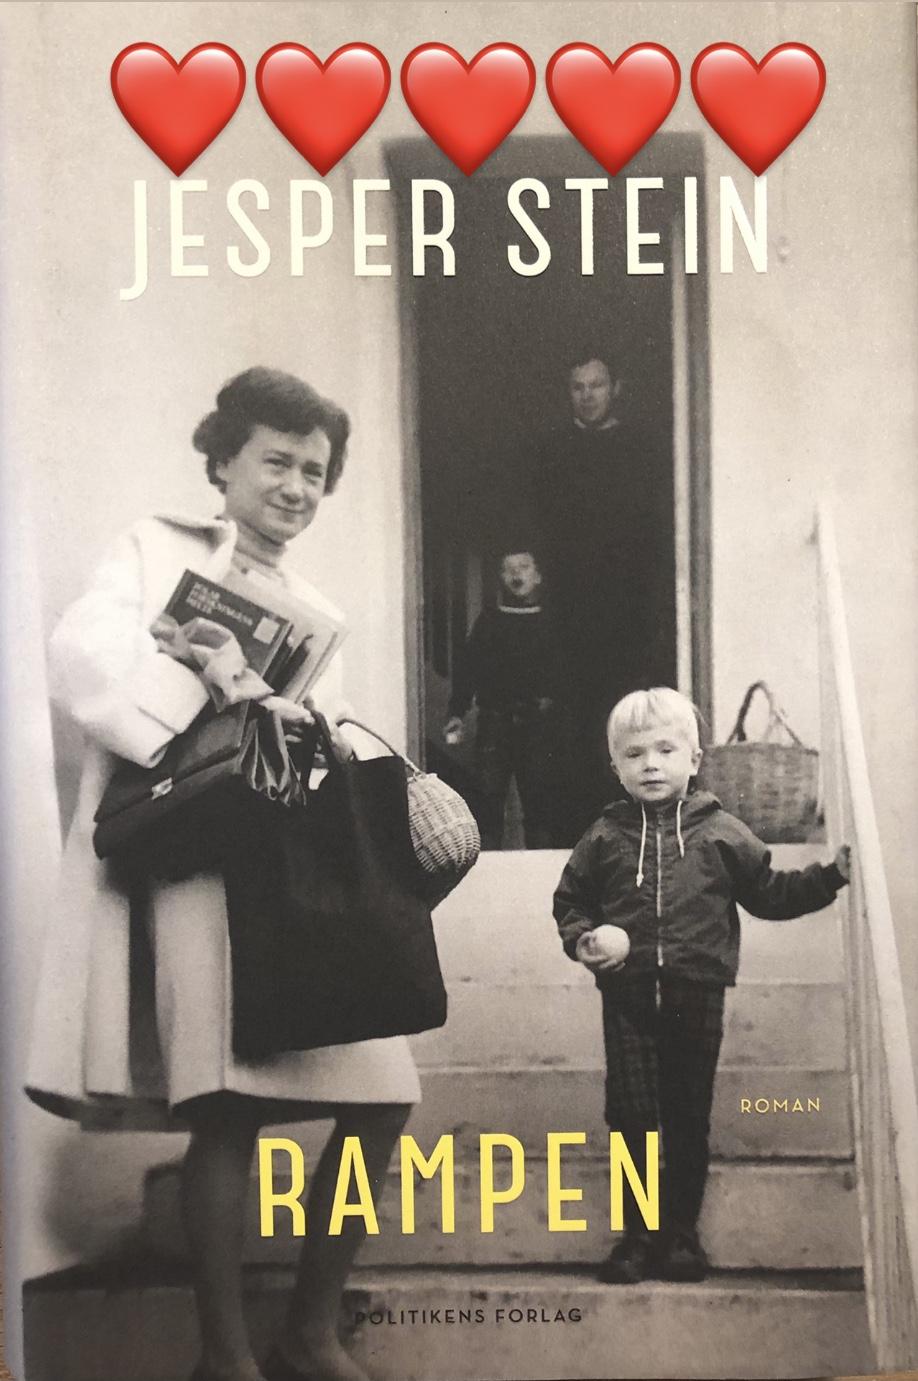 Rampen, Jesper Stein, Politikens Forlag, Roman, Biografi, Rampen af Jesper Stein, Axel Steen, krummeskrummelurer, krummeskrummelurer.dk, boganmeldelse, anbefaling, anmeldereksemplar,